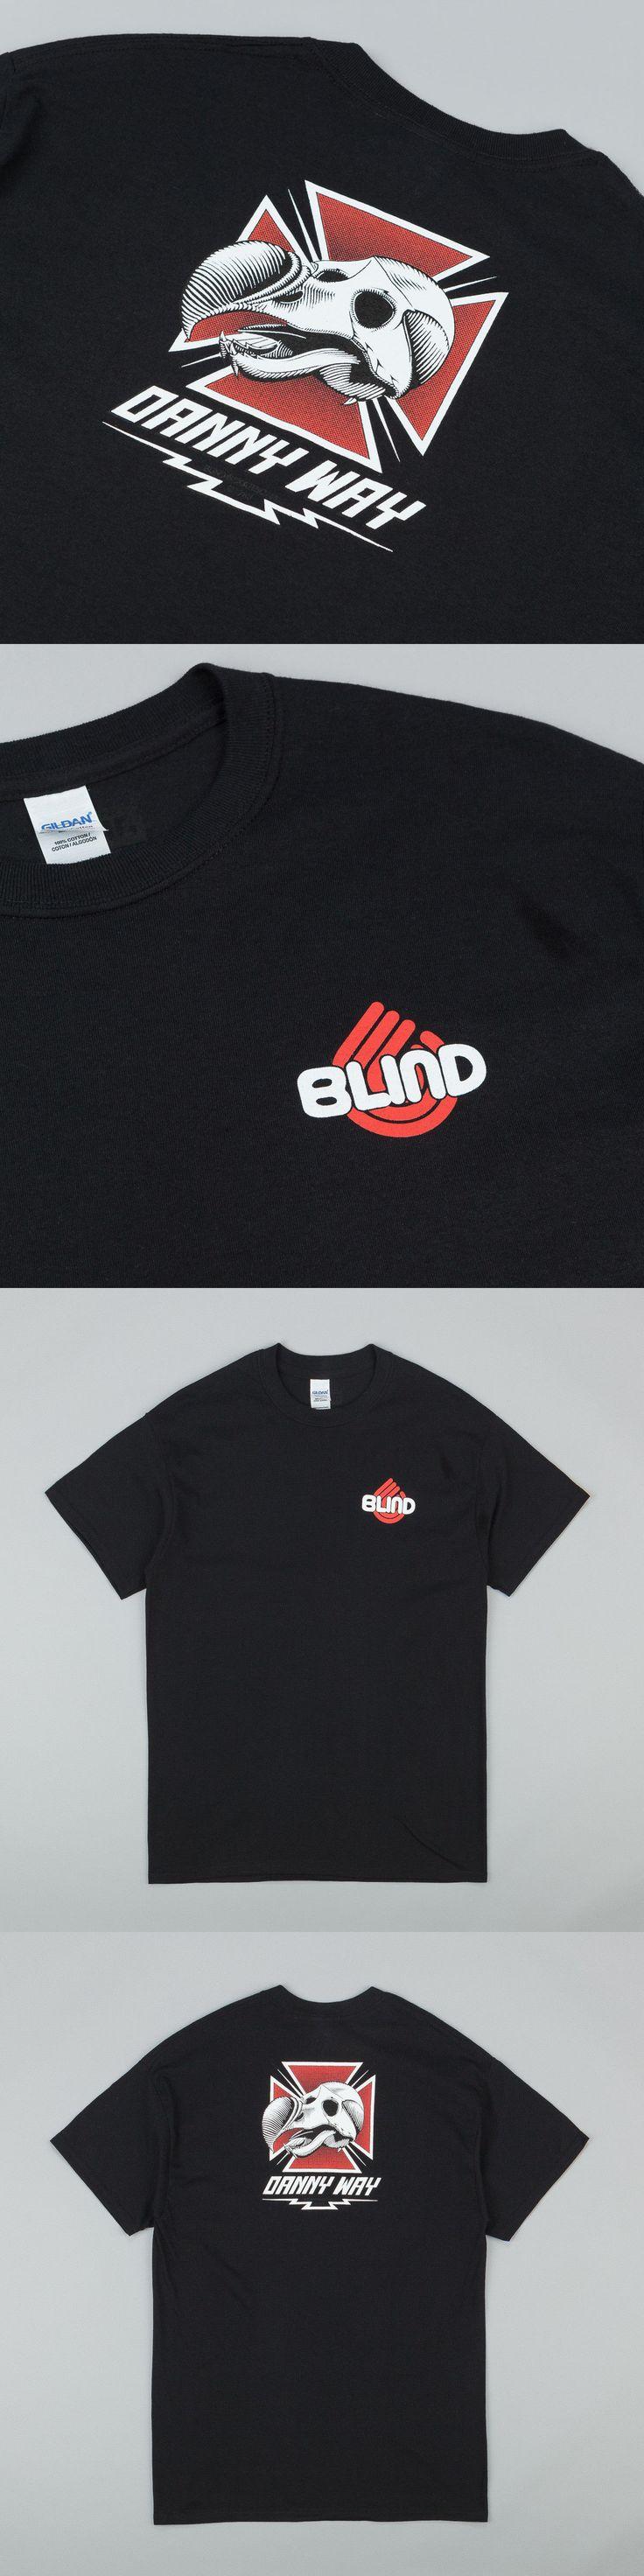 Men 159067: Dear Skating Danny Way Blind Dodo Black T-Shirt Medium Tony Hawk Powell Rocco -> BUY IT NOW ONLY: $60 on eBay!